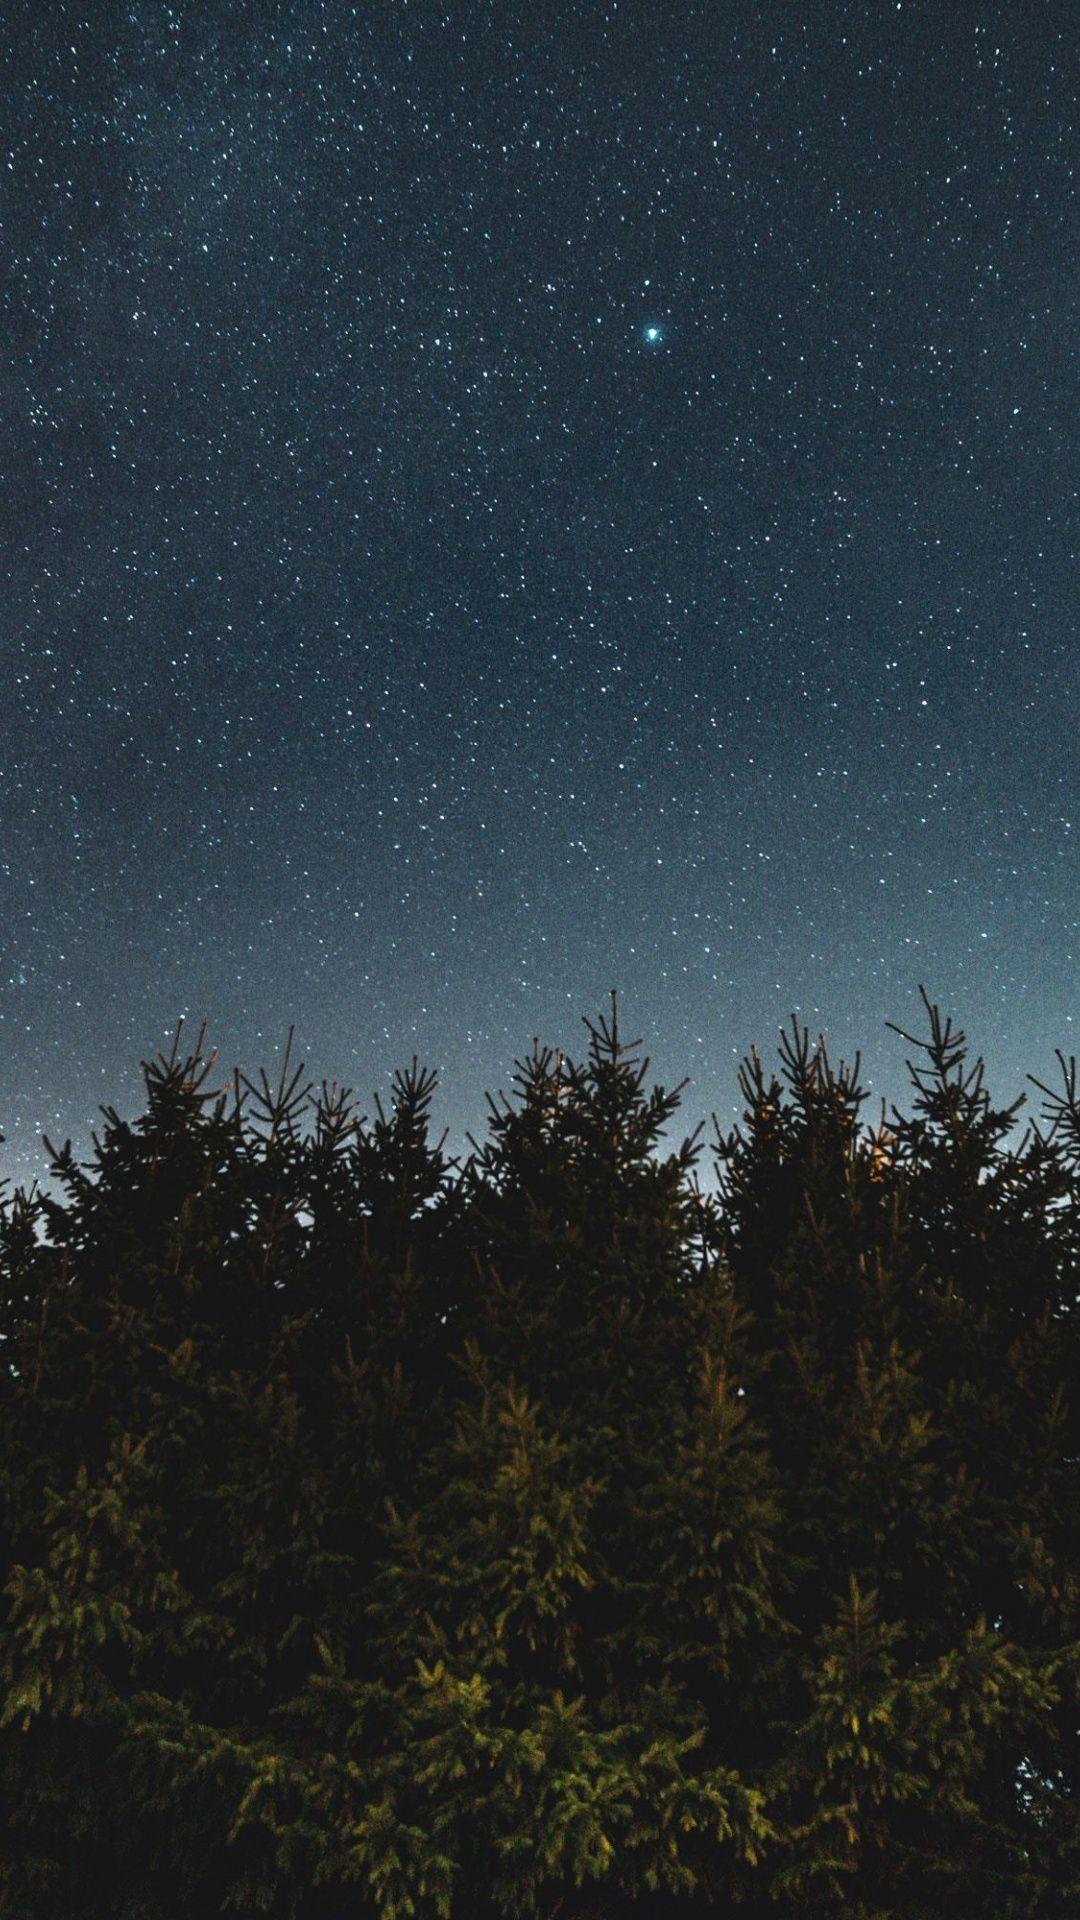 Nature Starry Sky Trees Night 1080x1920 Wallpaper Night Sky Wallpaper Galaxies Wallpaper Night Sky Photography